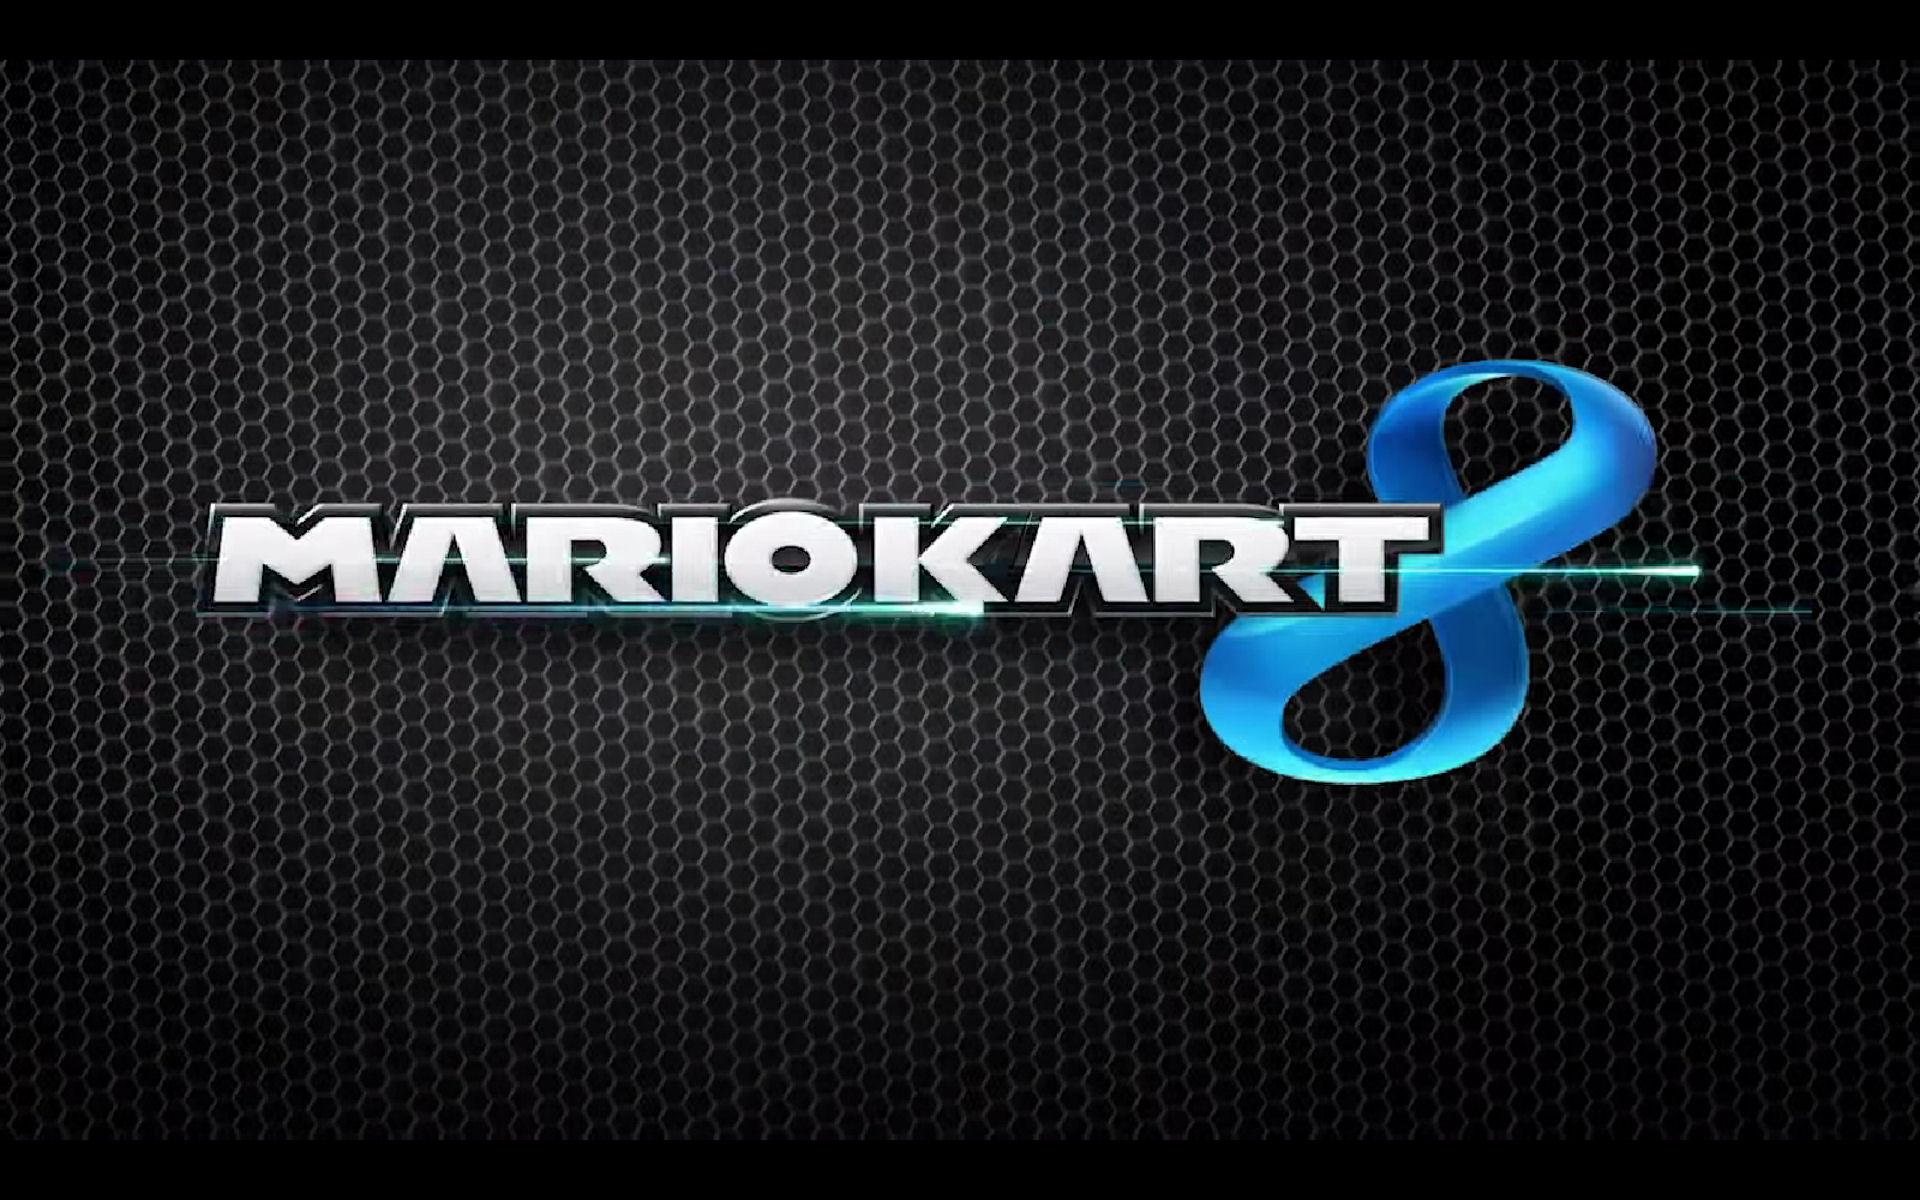 Mario Kart 8 Logo Wallpaper